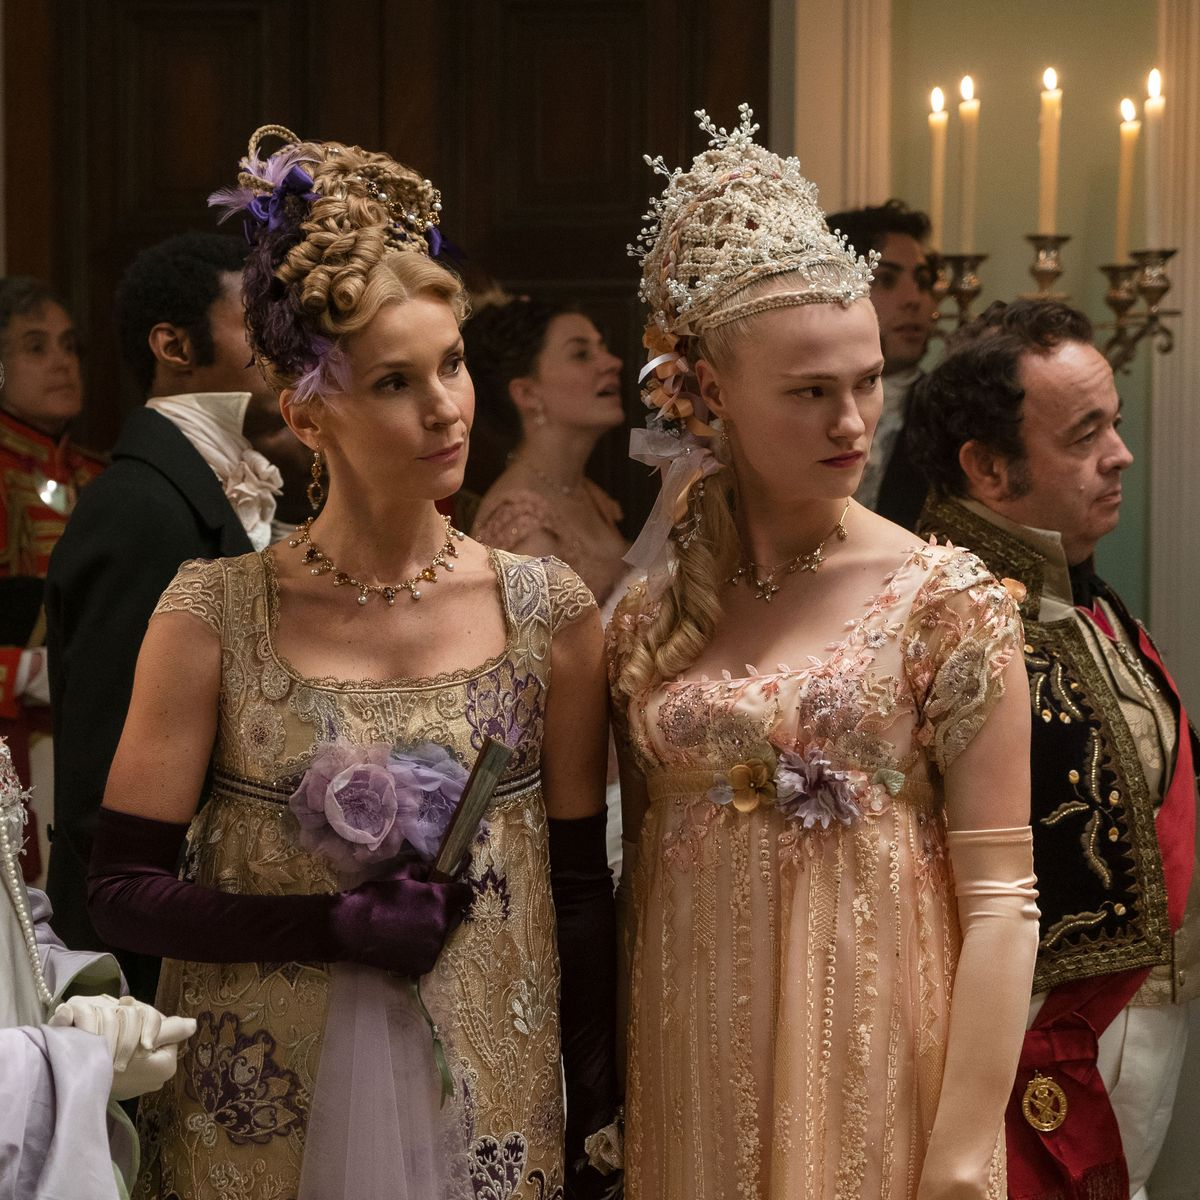 Bridgerton Recap, Season 1 Episode 3: 'The Art of the Swoon'